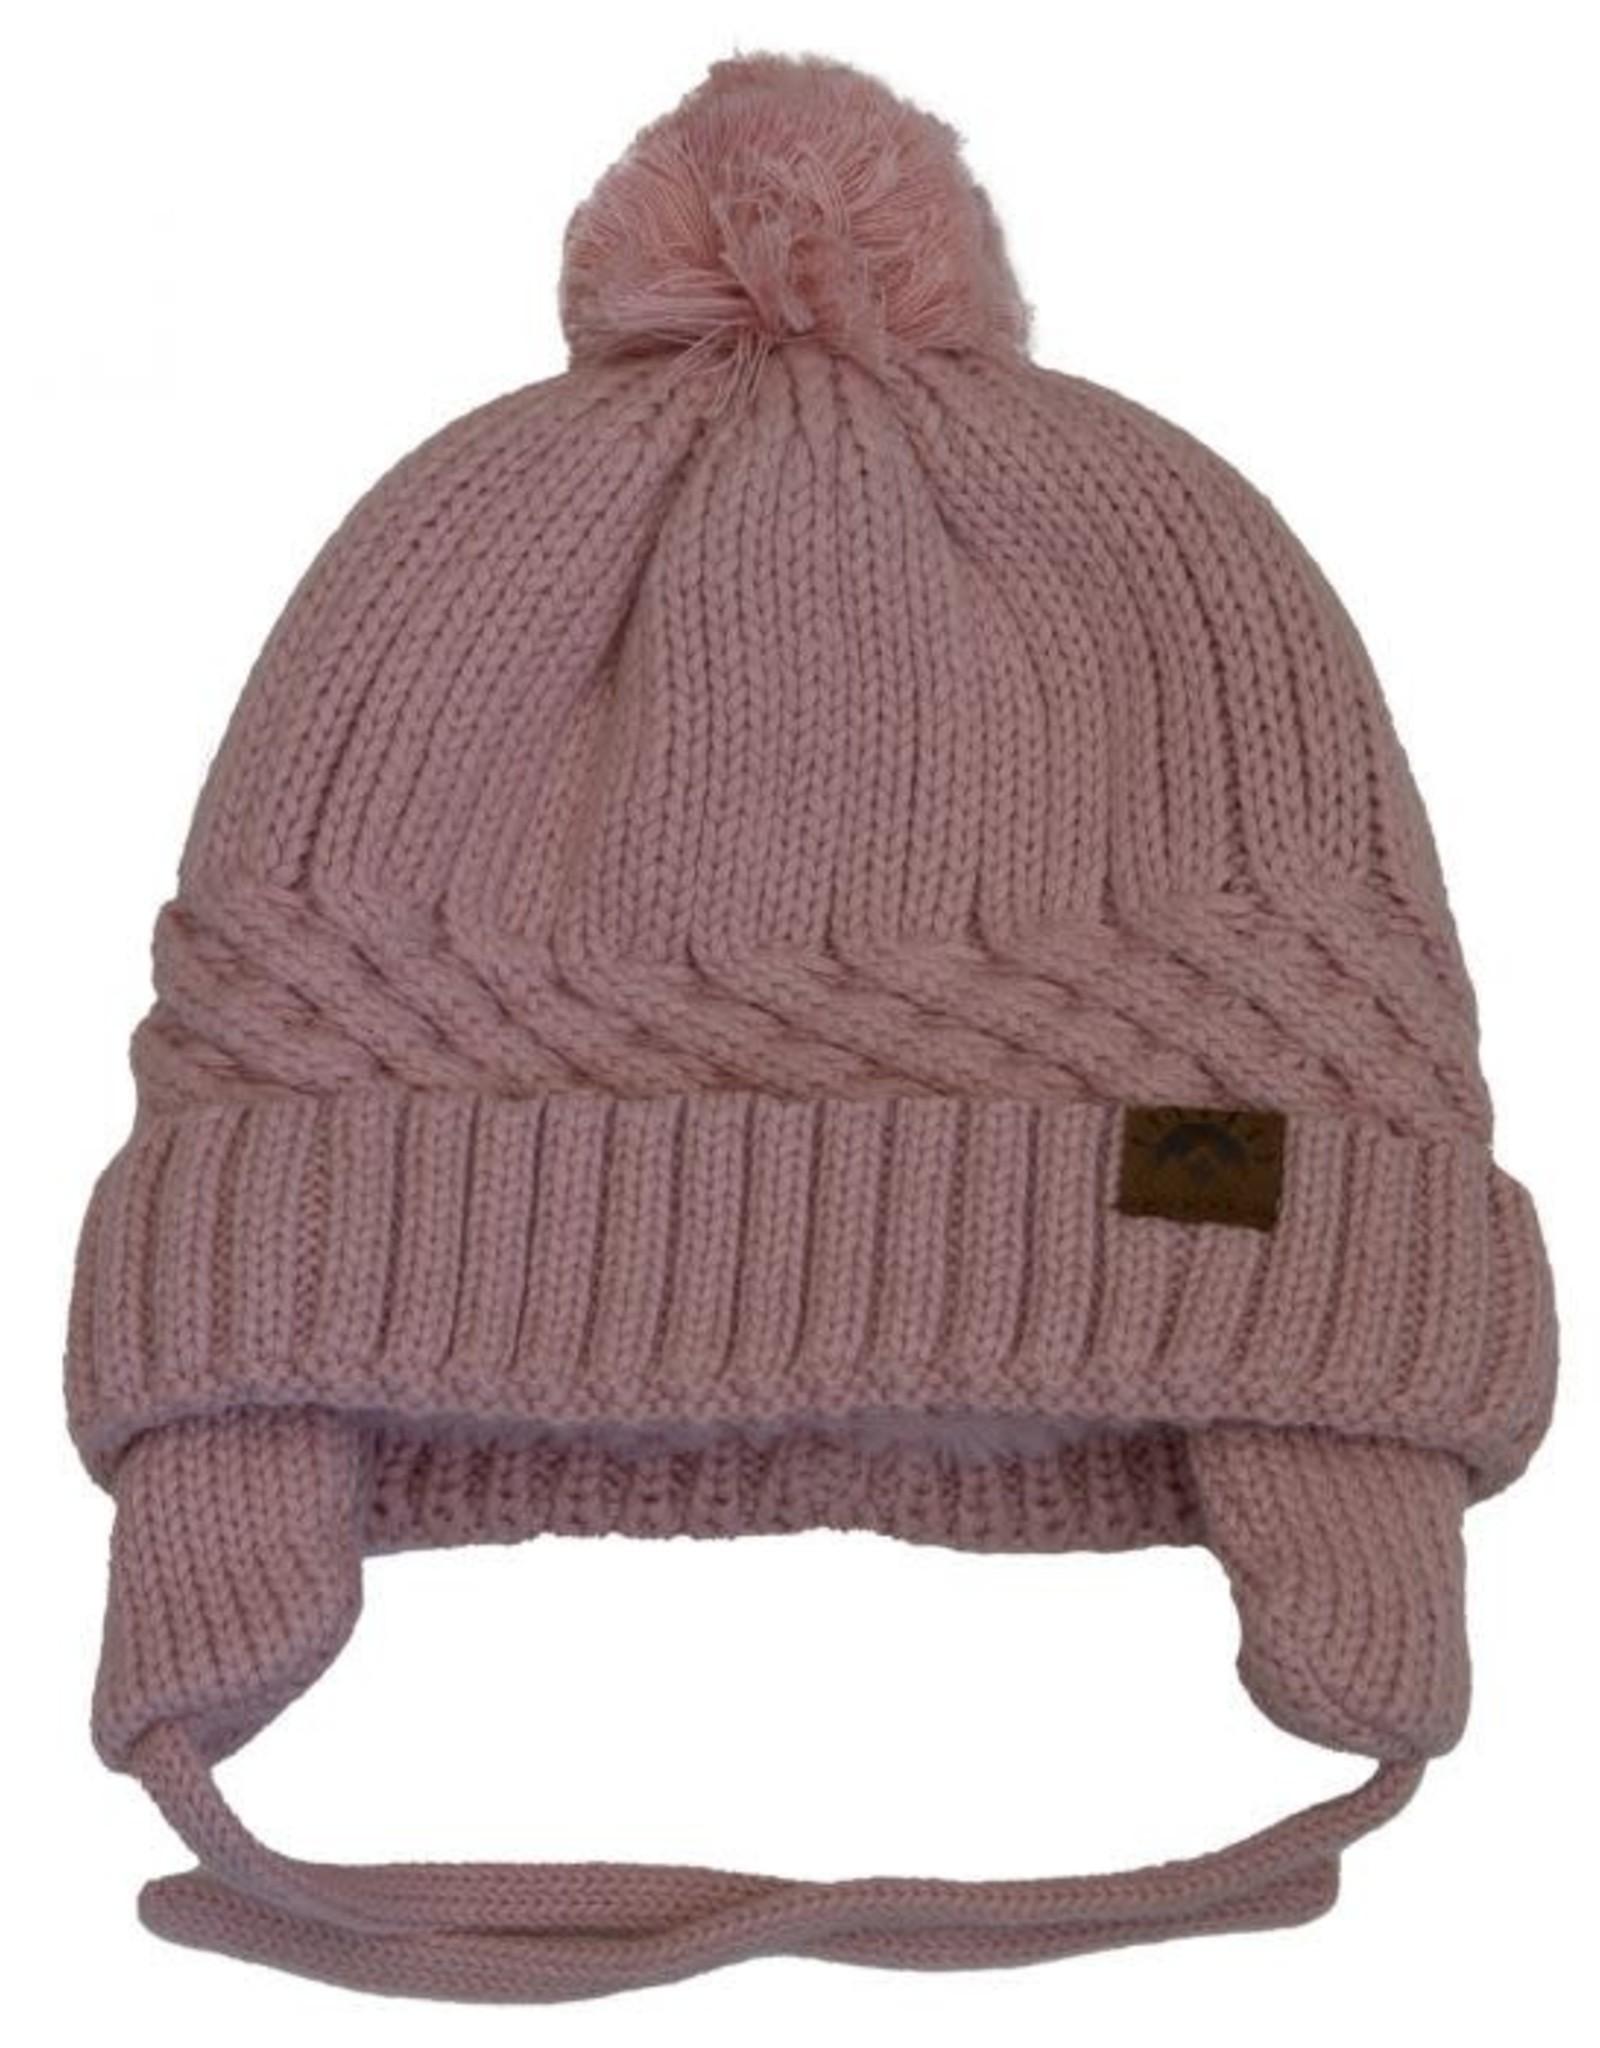 Calikids Ballet Pink Knit Hat w tie